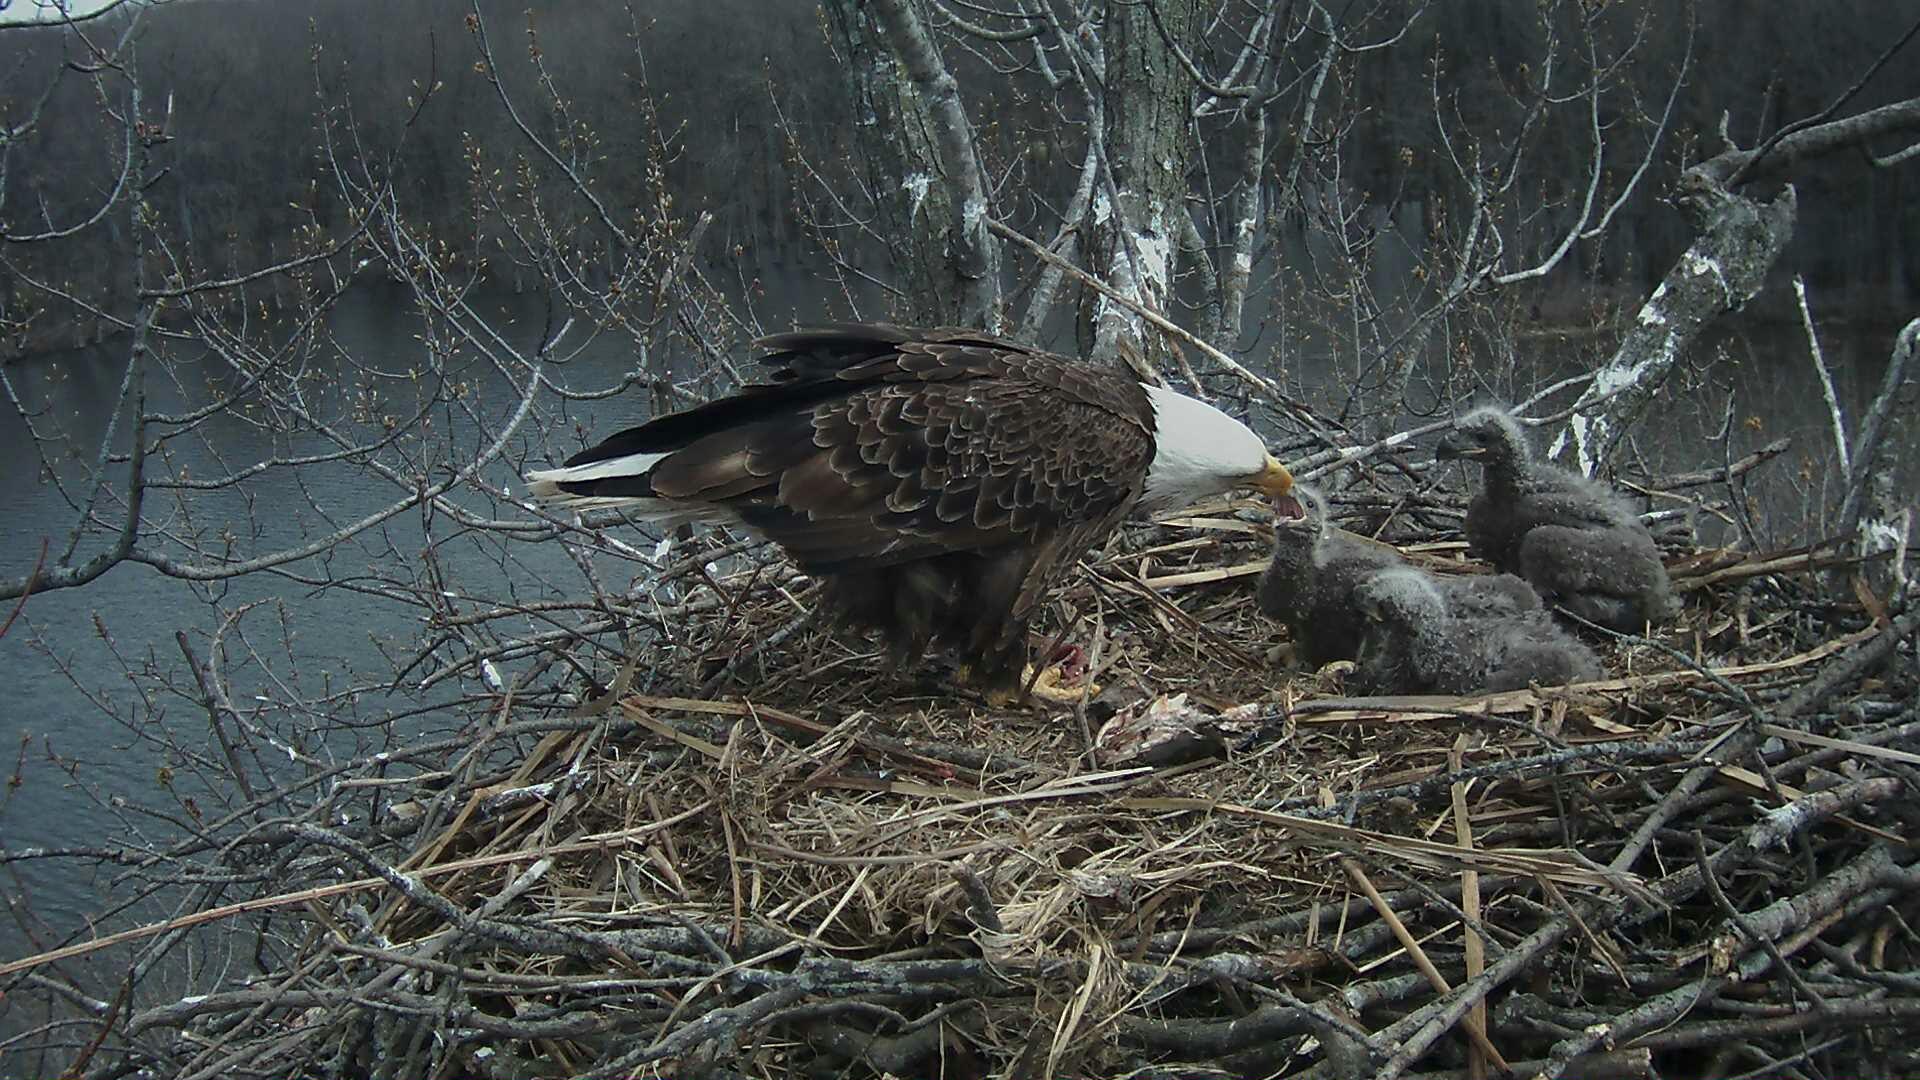 Feeding time April 4, 2016